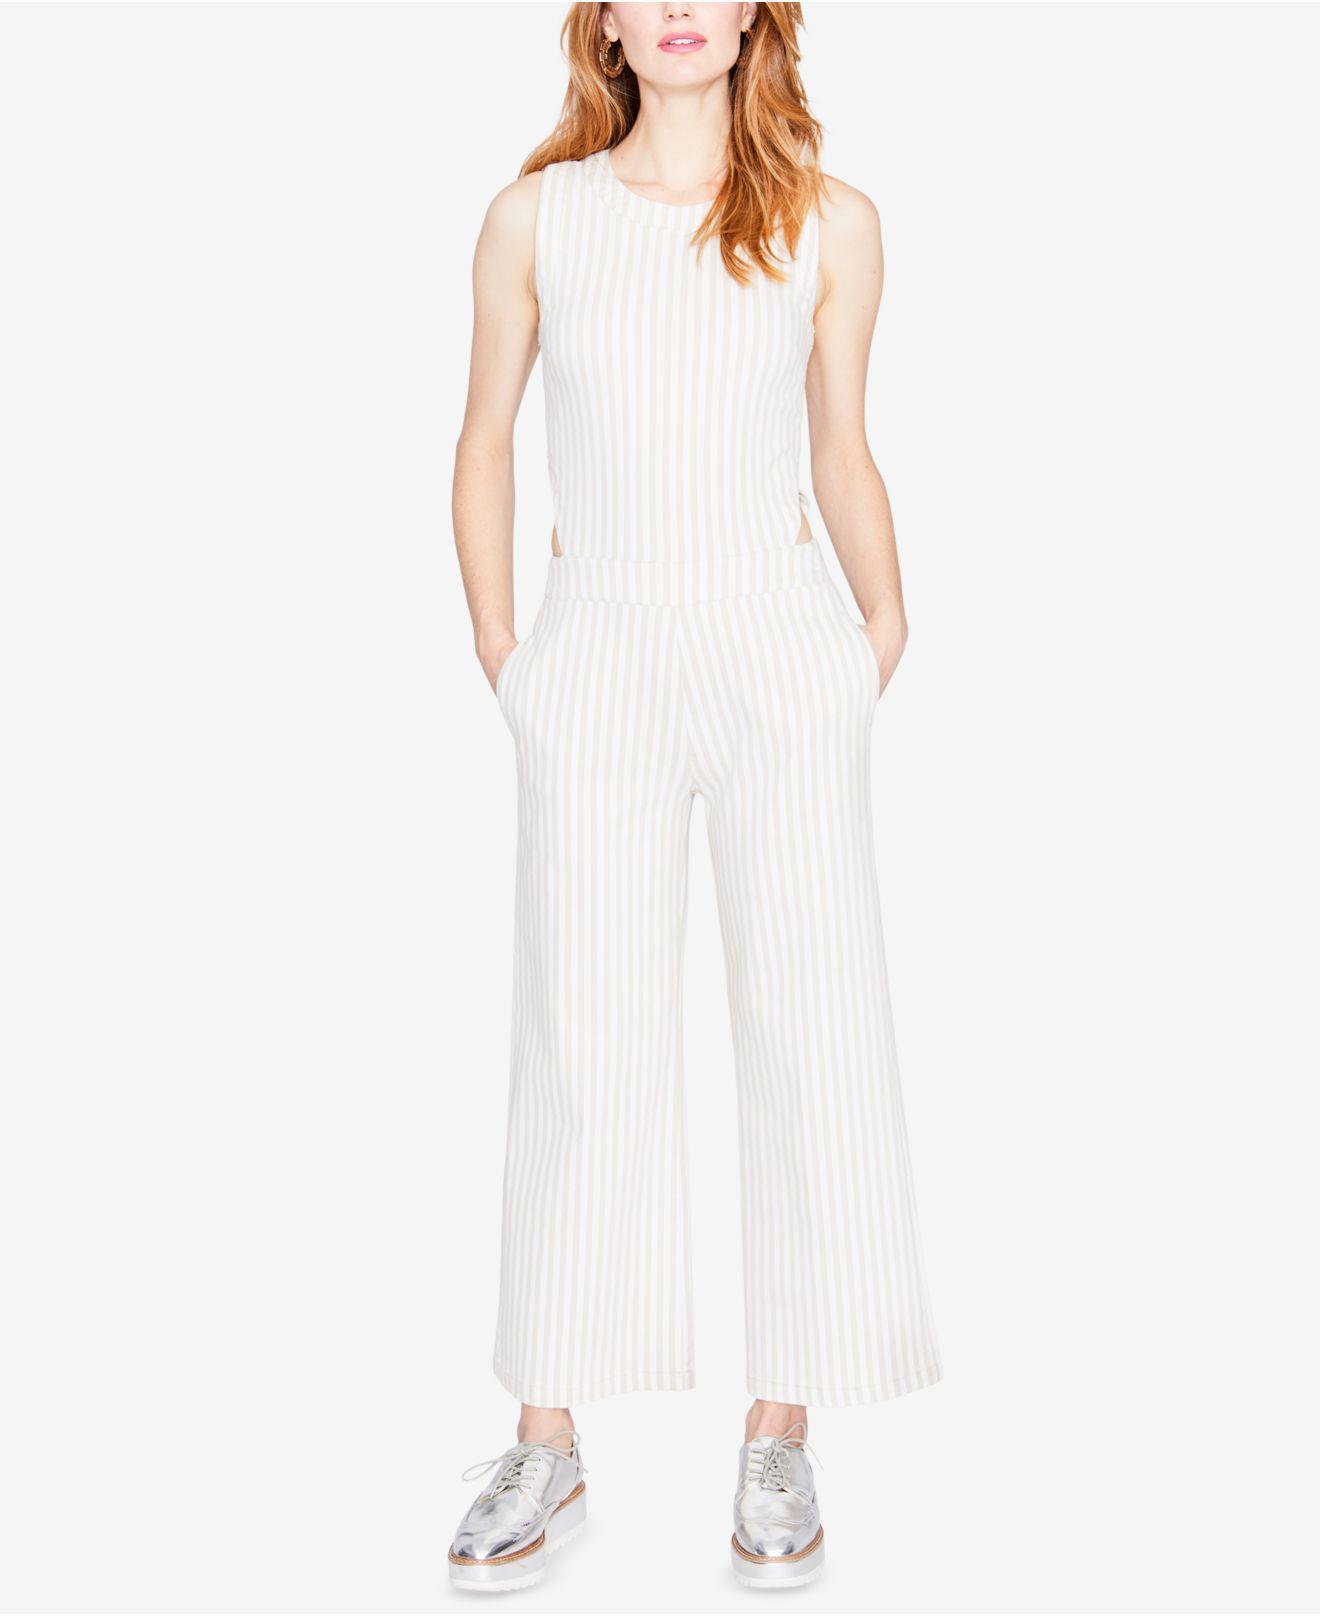 701e10082fc9 Lyst - RACHEL Rachel Roy Striped Side-cutout Jumpsuit